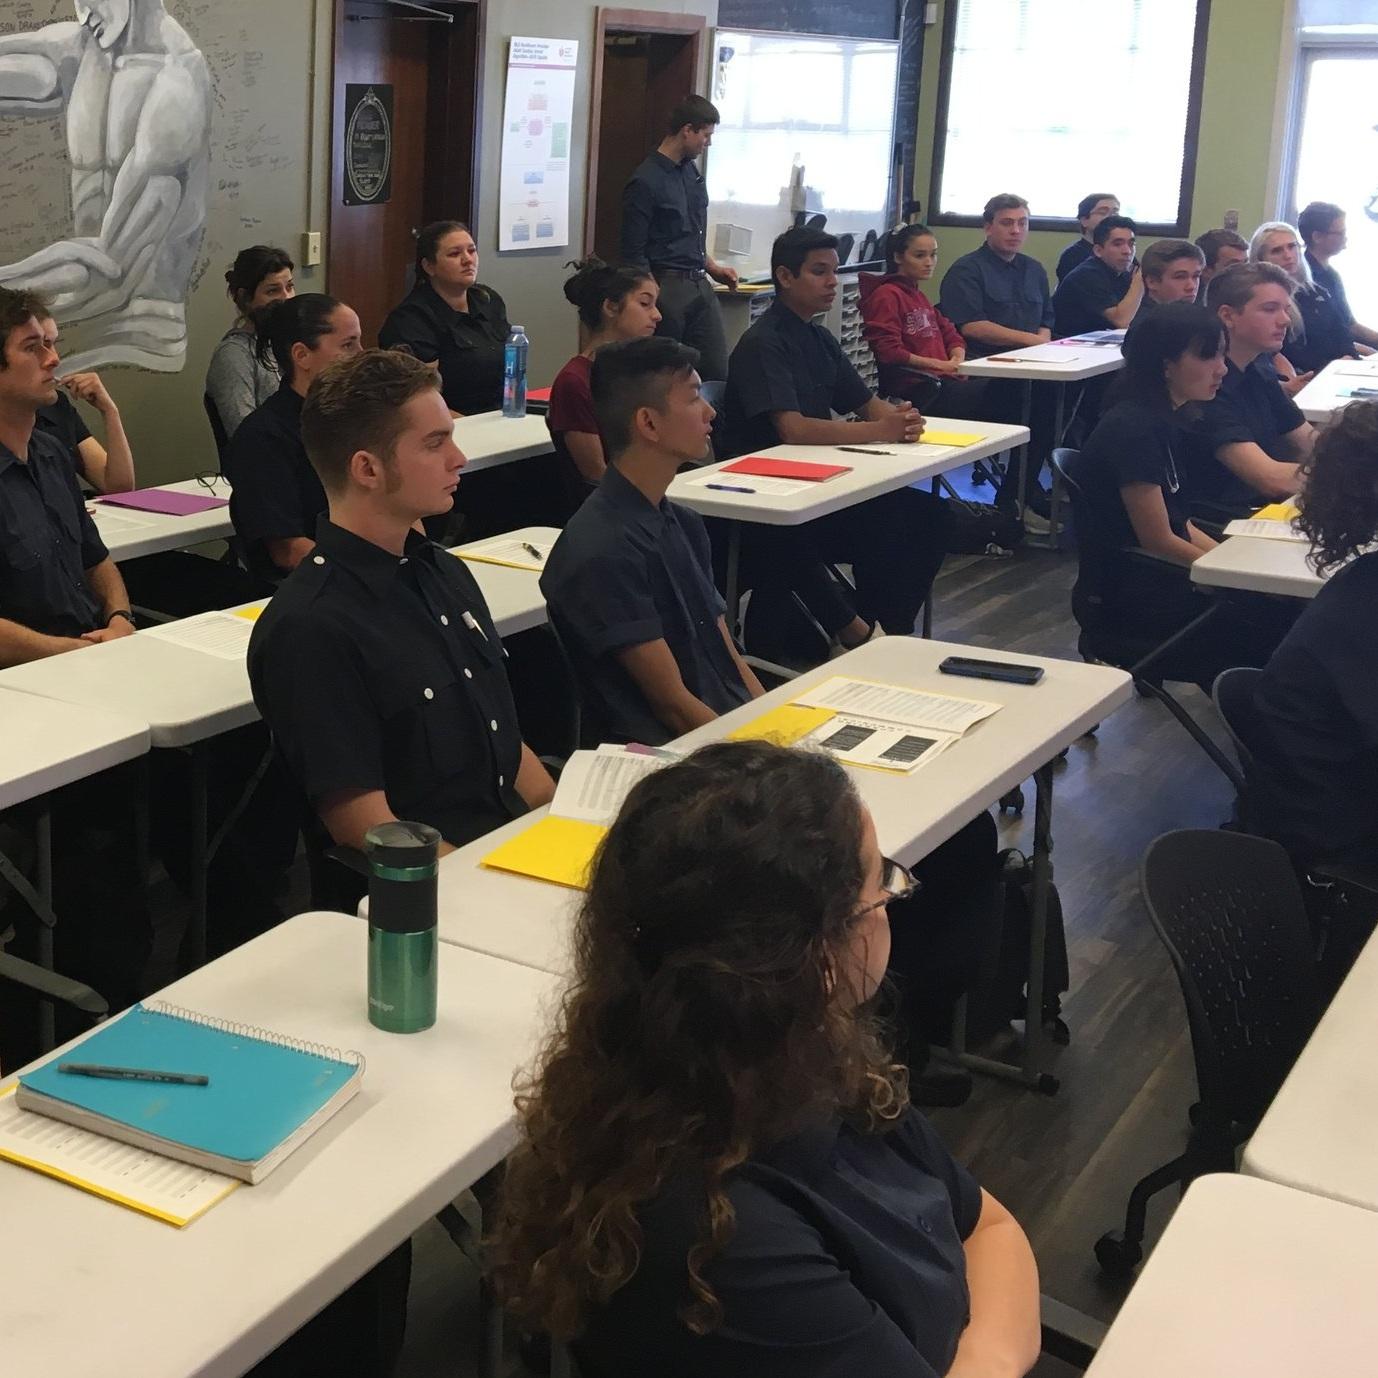 Defib Academy Class of Summer 2019 Orientation